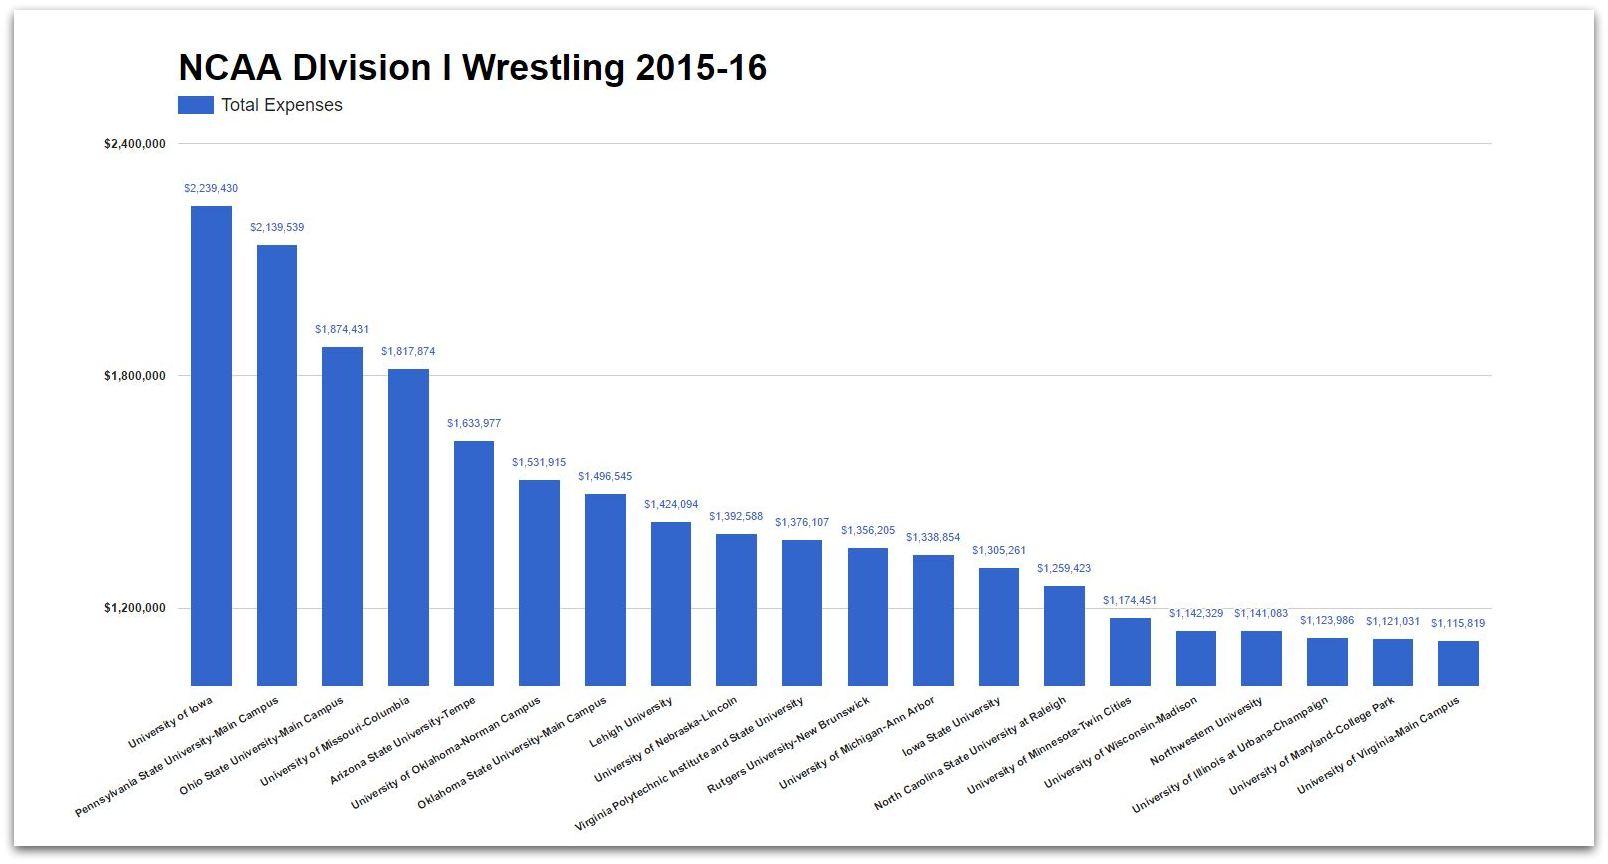 Twenty Most Expensive Division I Programs Source: US Dept. of Education  Click to Enlarge